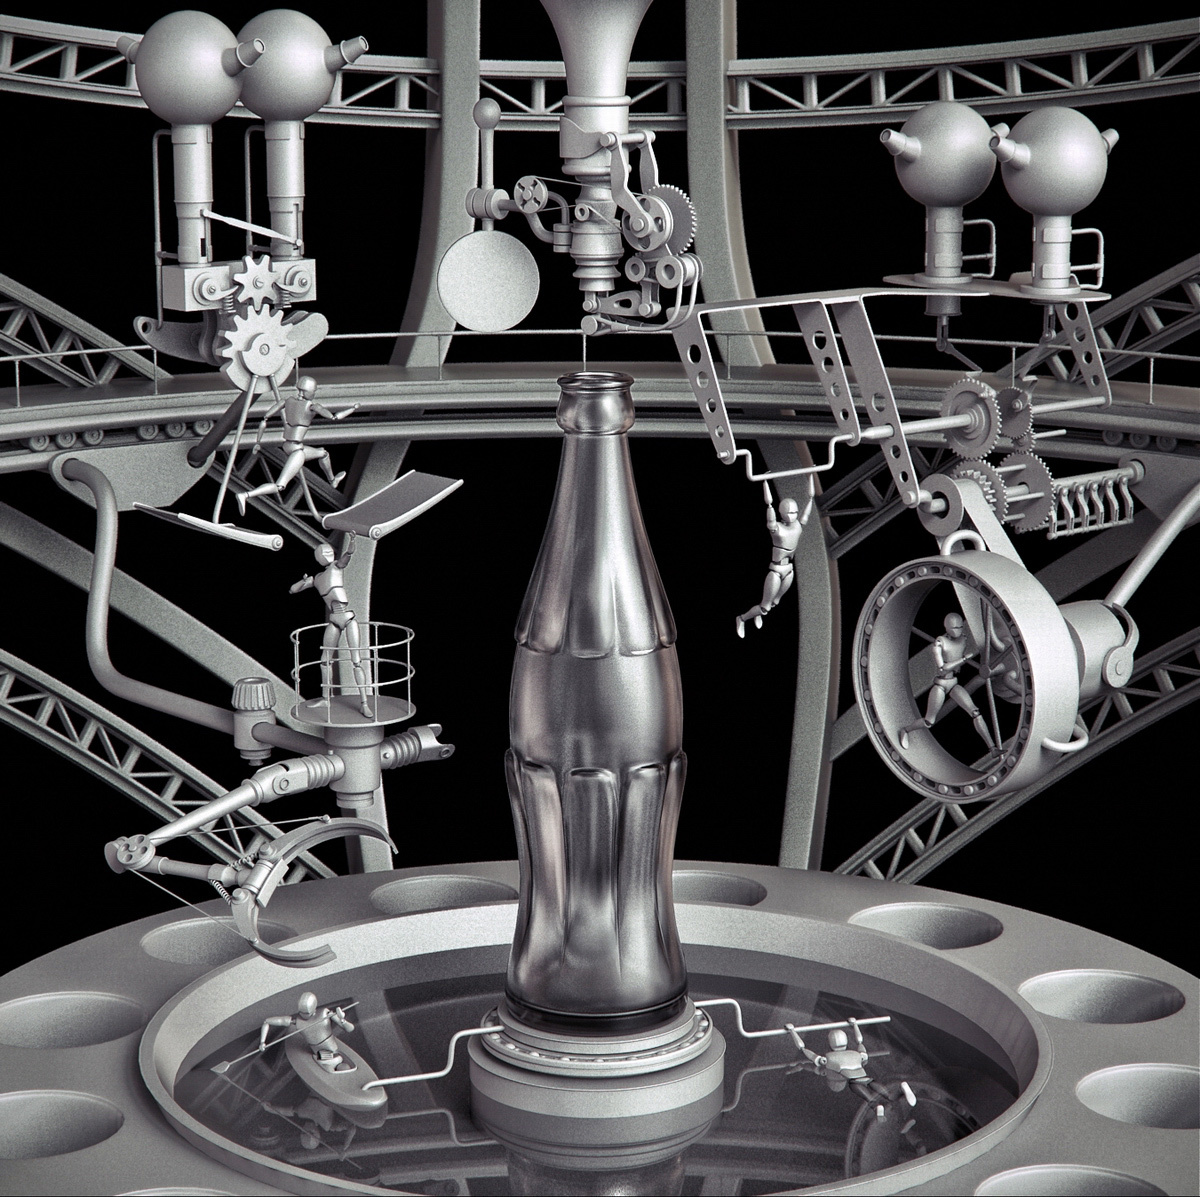 Les créations 3D d'art digital ultra détaillées d'Aleksandr Kuskov